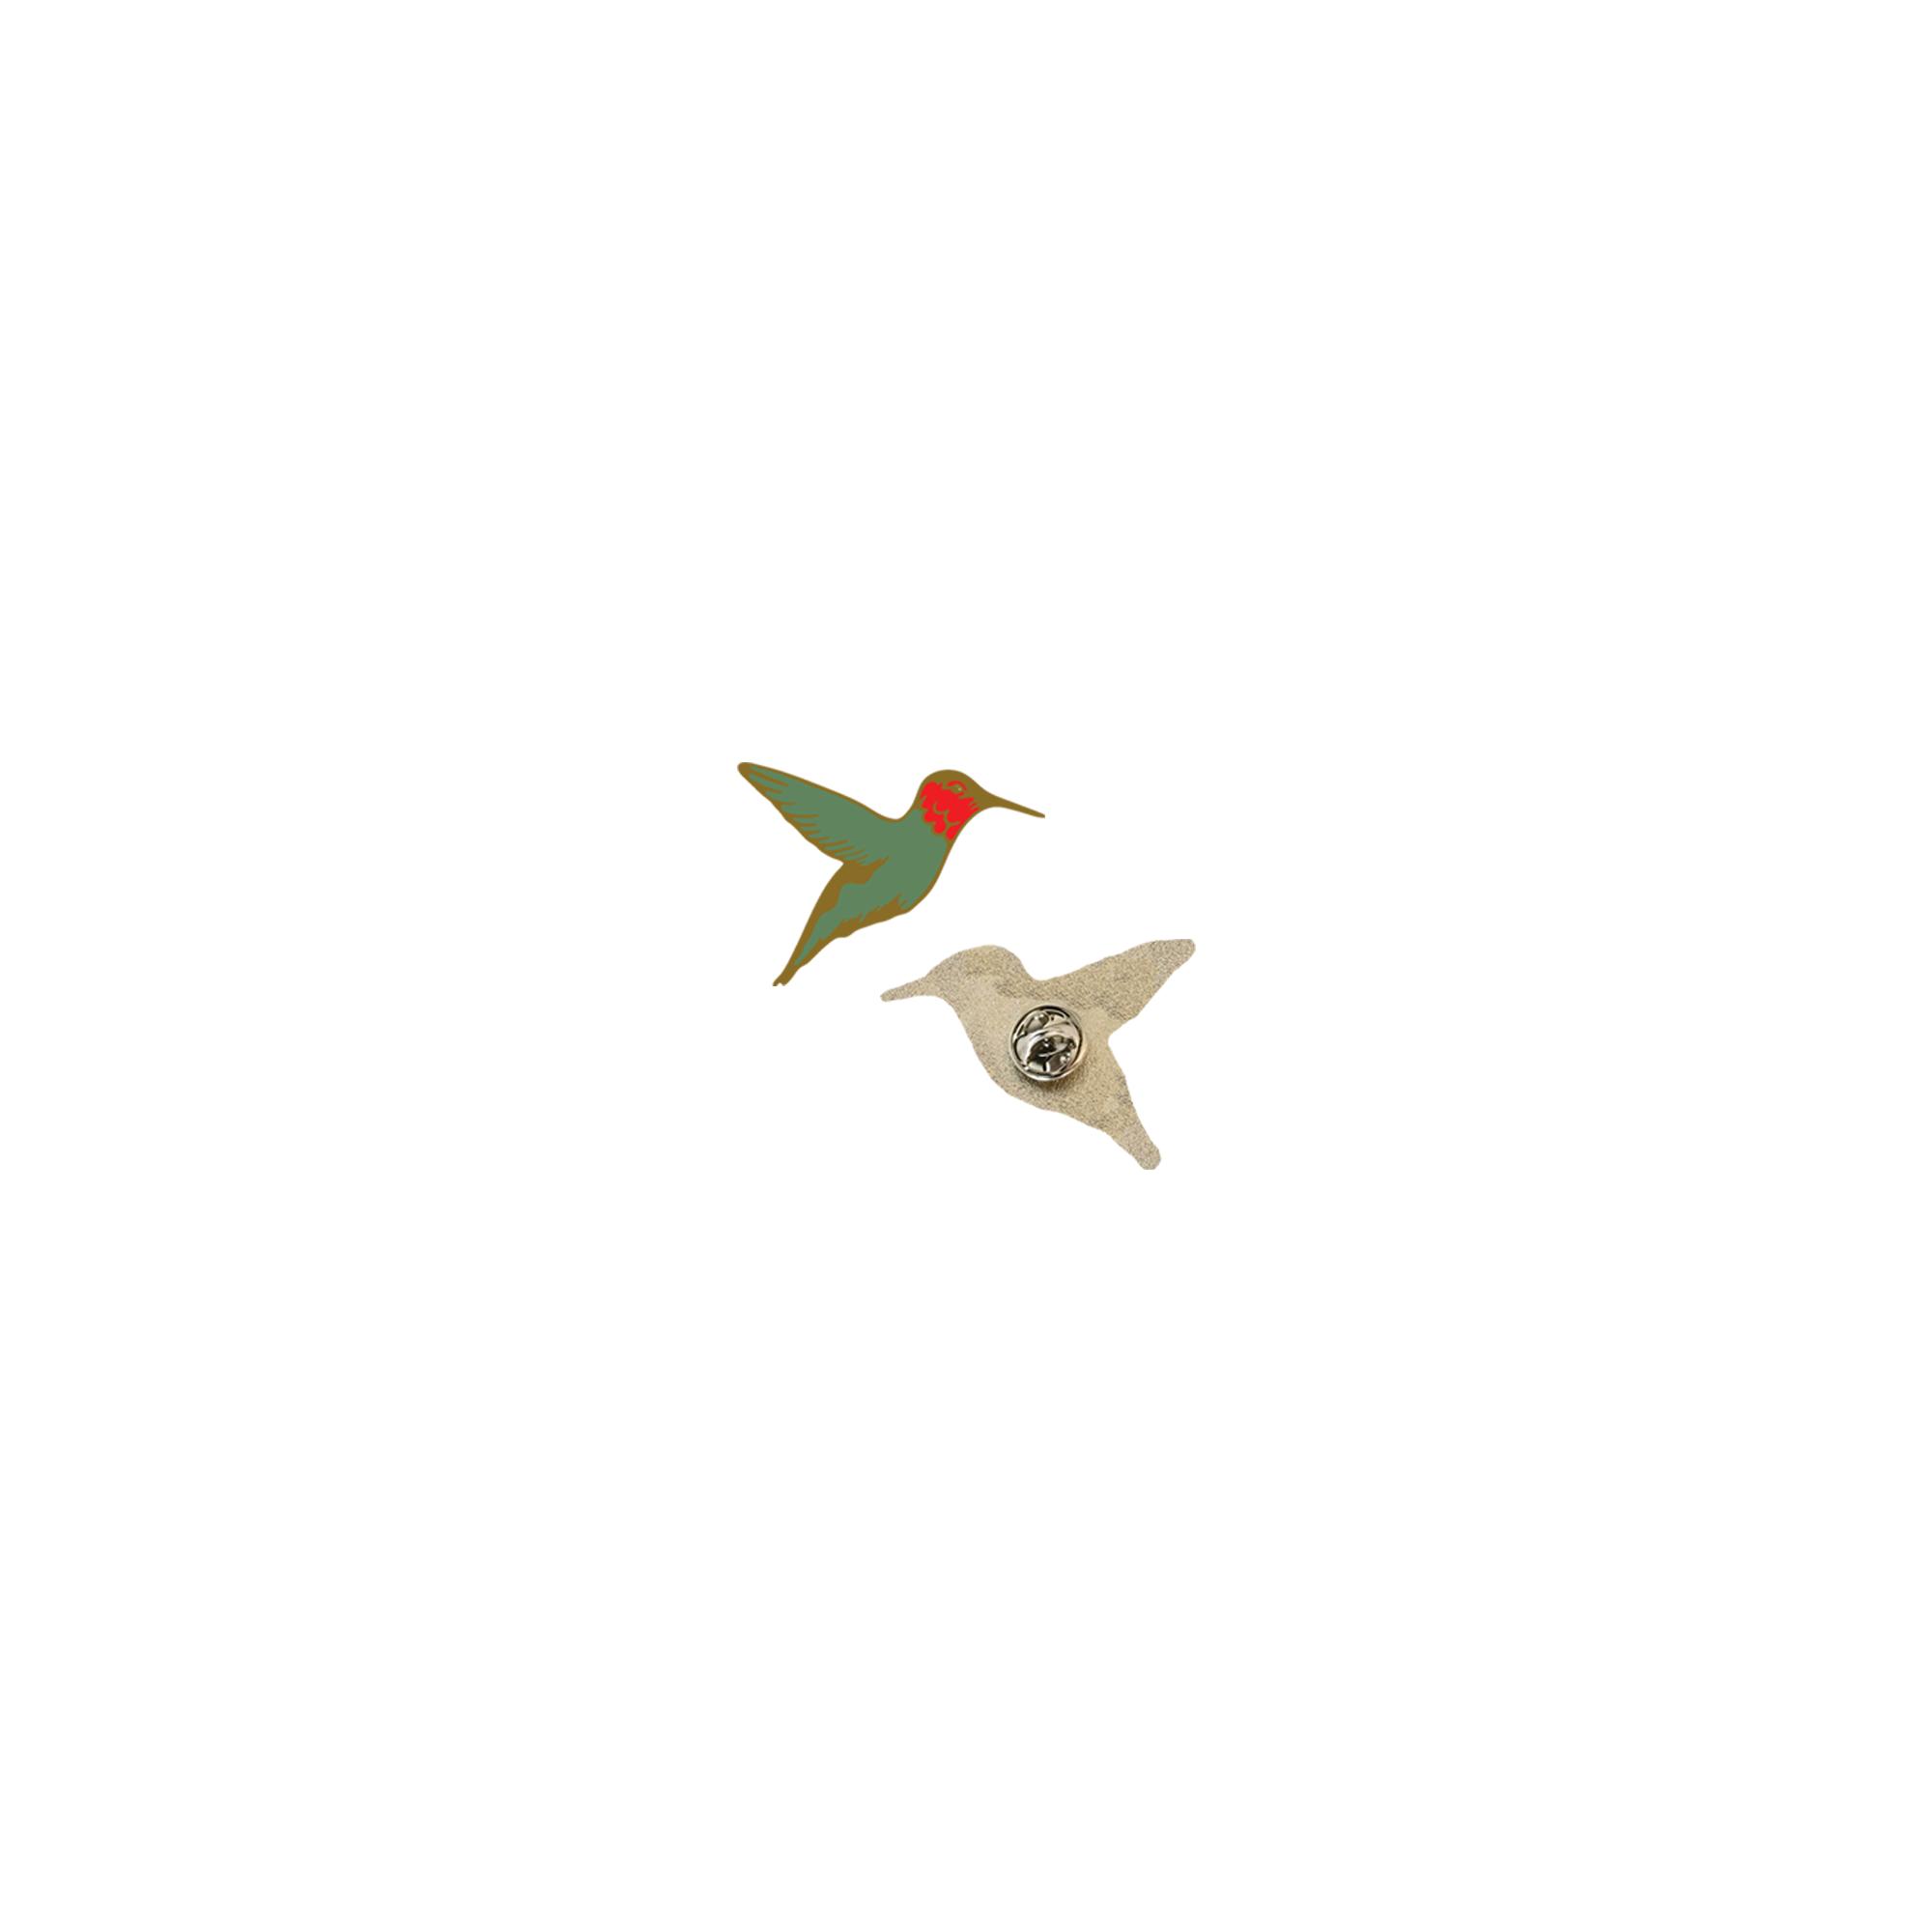 Bedouine – 'Bird Songs of a Killjoy' – Hummingbird enamel pin - Spacebomb Records